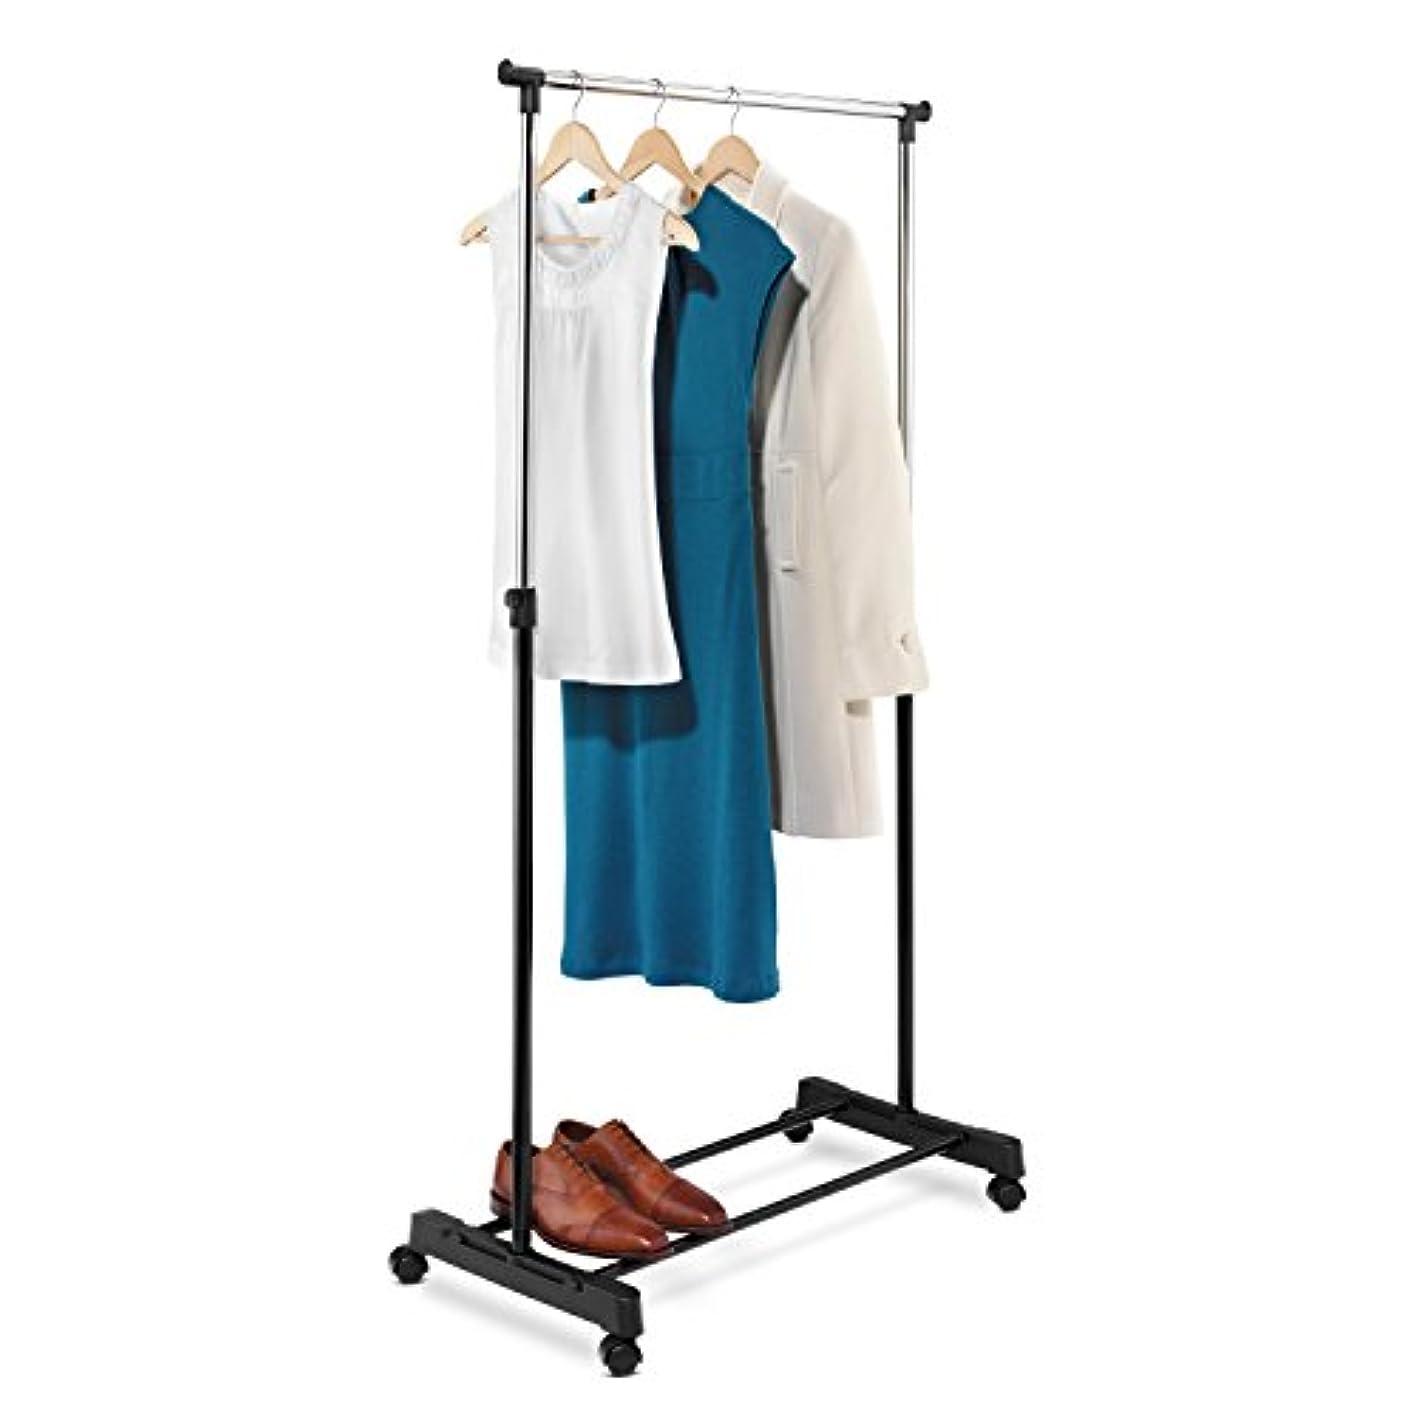 Honey-Can-Do GAR-01122 Adjustable Height Garment Rack, Chrome/b, 33.1